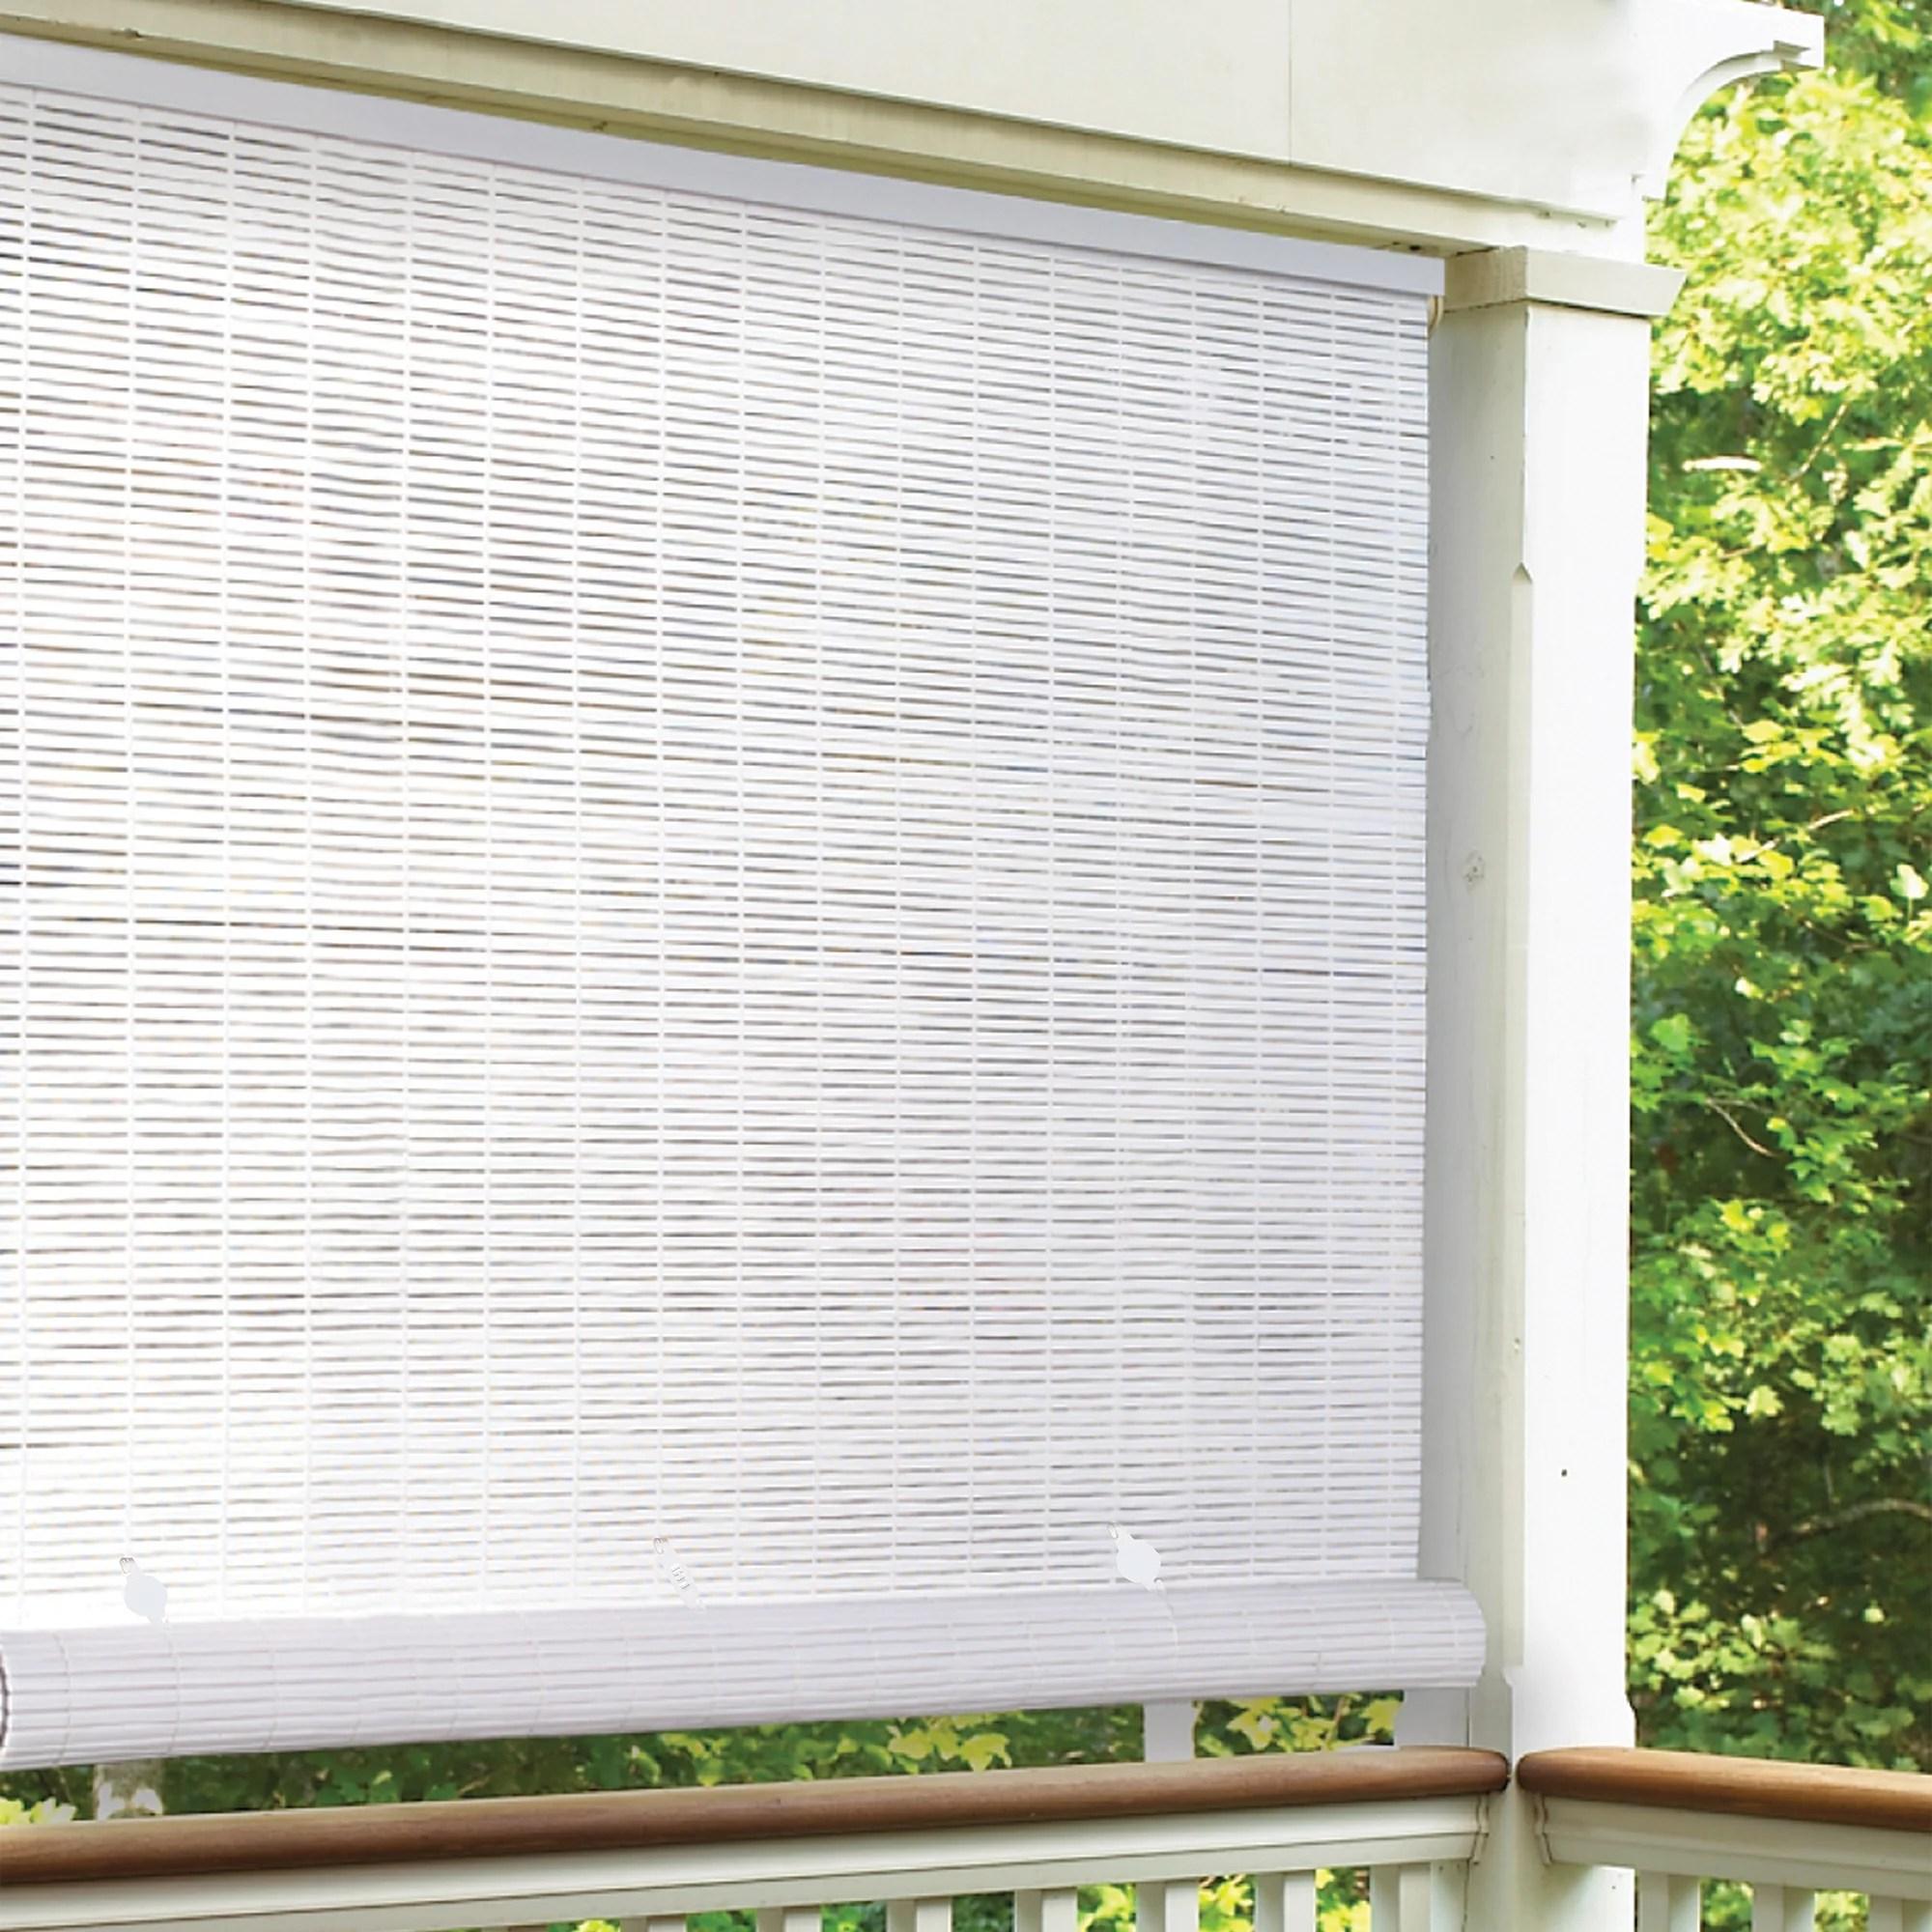 radiance 6 x 6 cordless 1 4 pvc roll up outdoor sun shade white walmart com